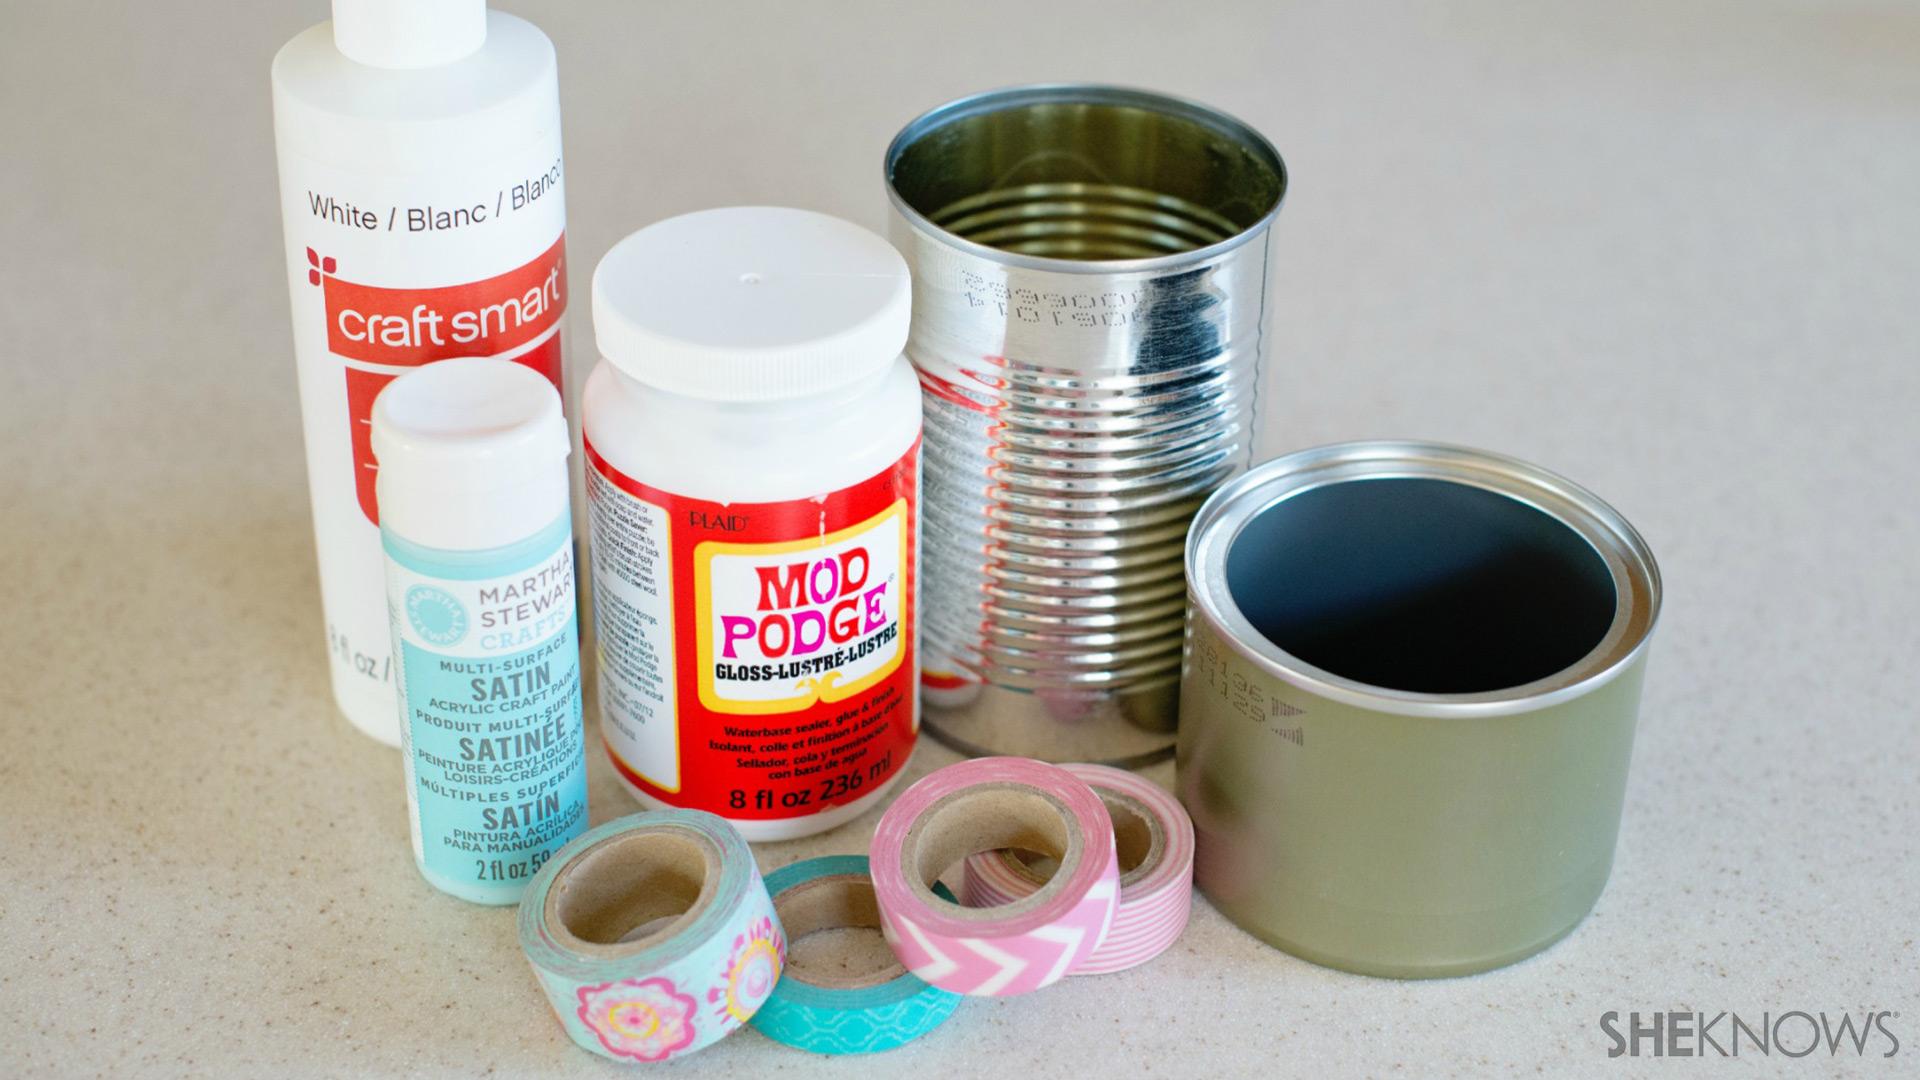 Tin can pencil holder | Sheknows.com - supplies